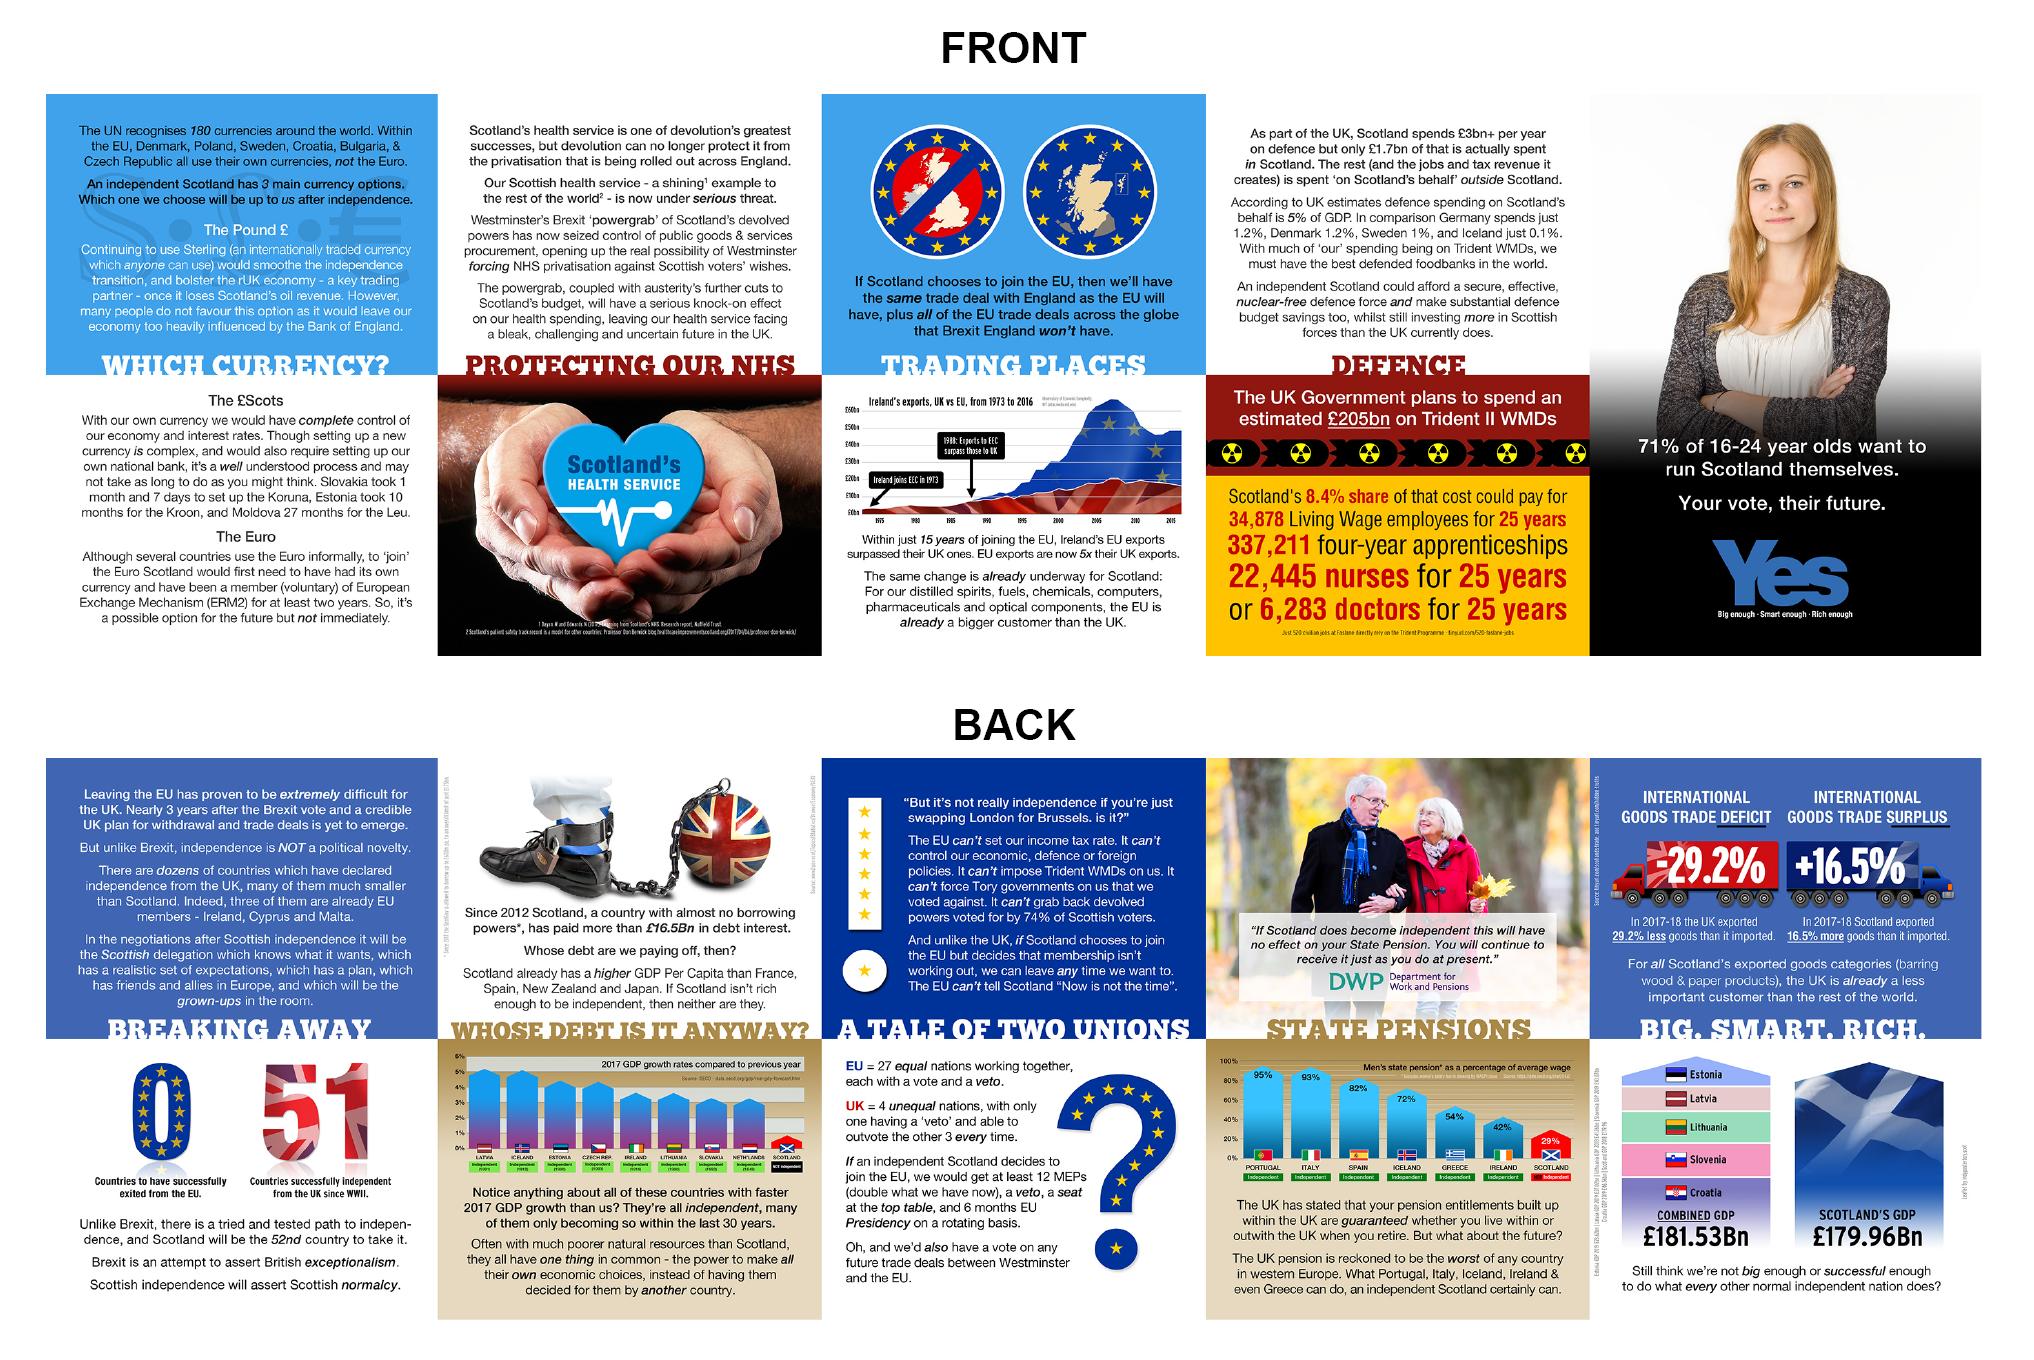 Indy Factsheet 2,500